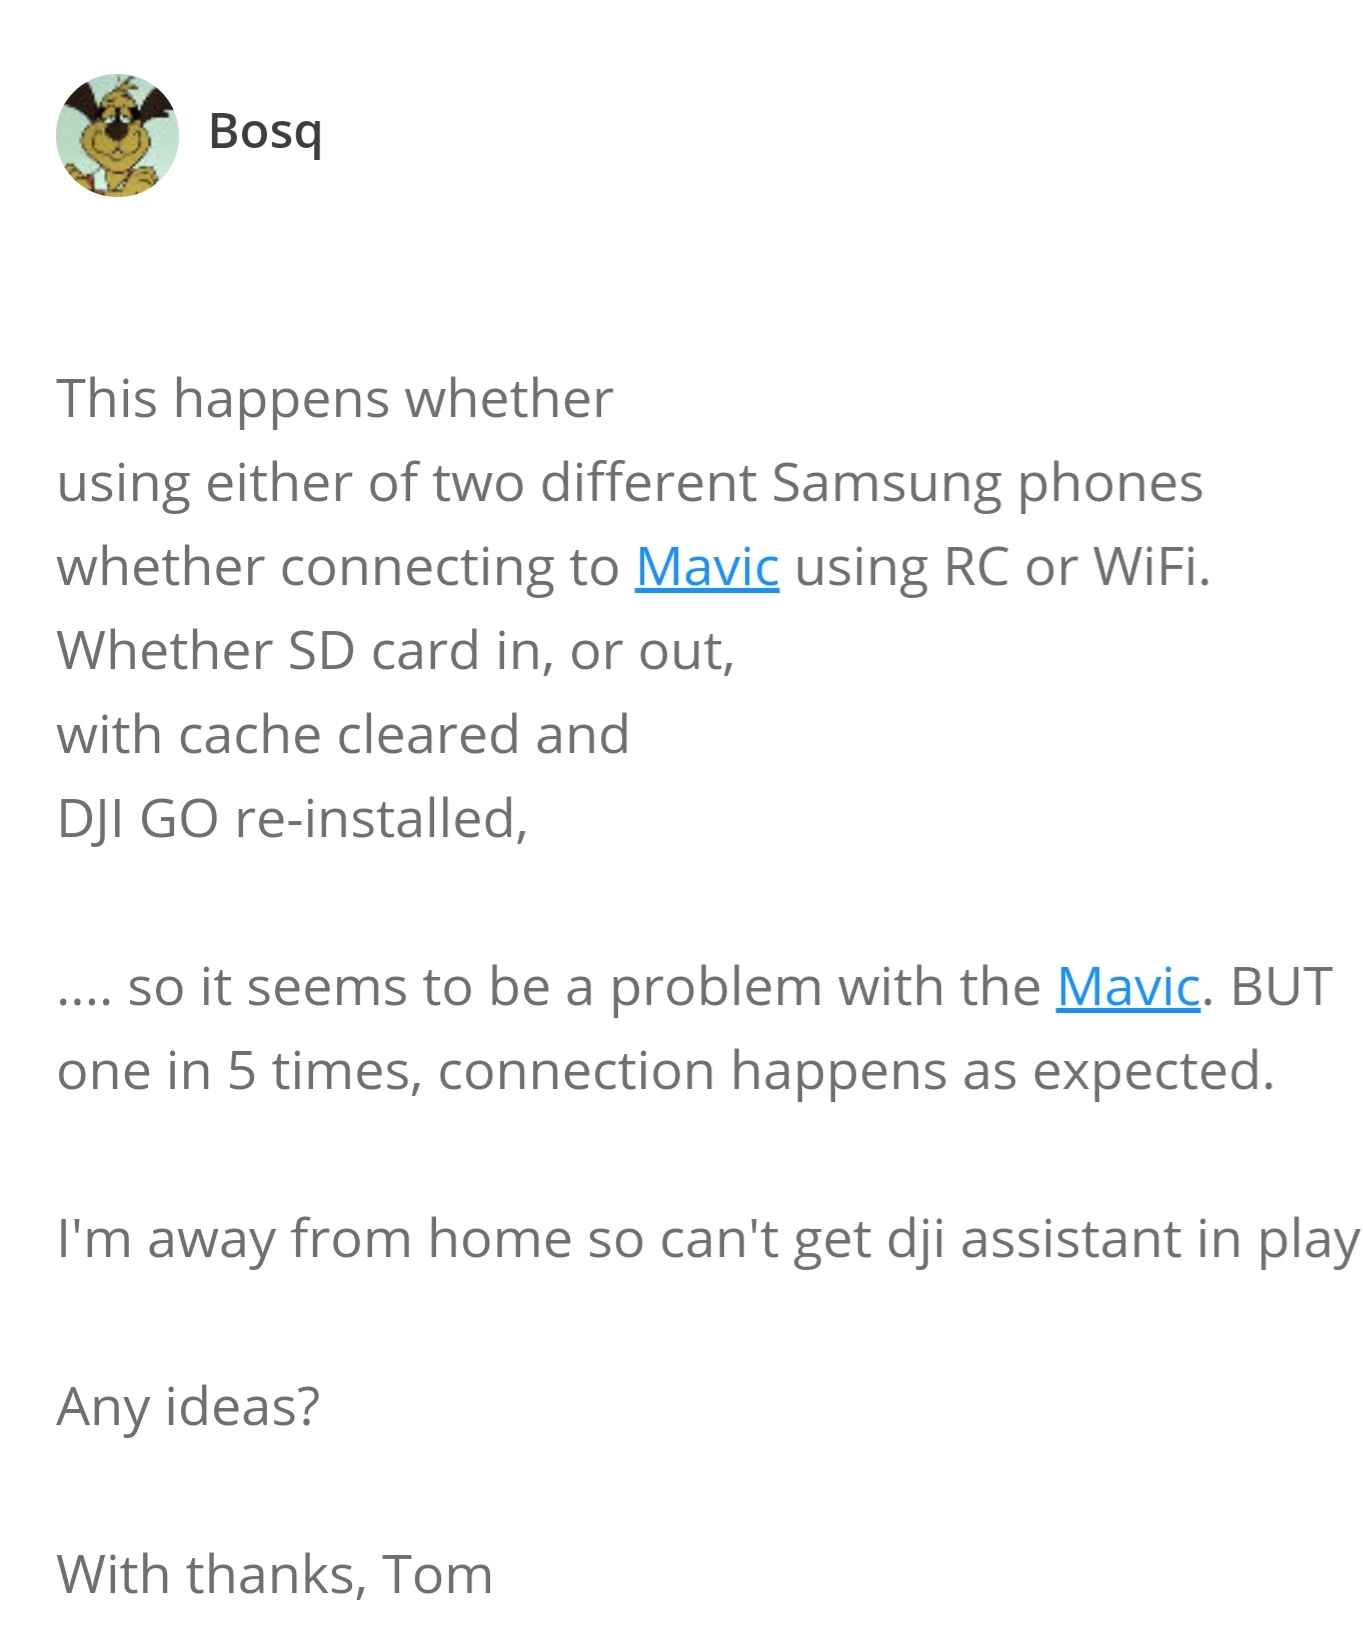 DJI GO and LITCHI both stop upon Mavic Pro connection